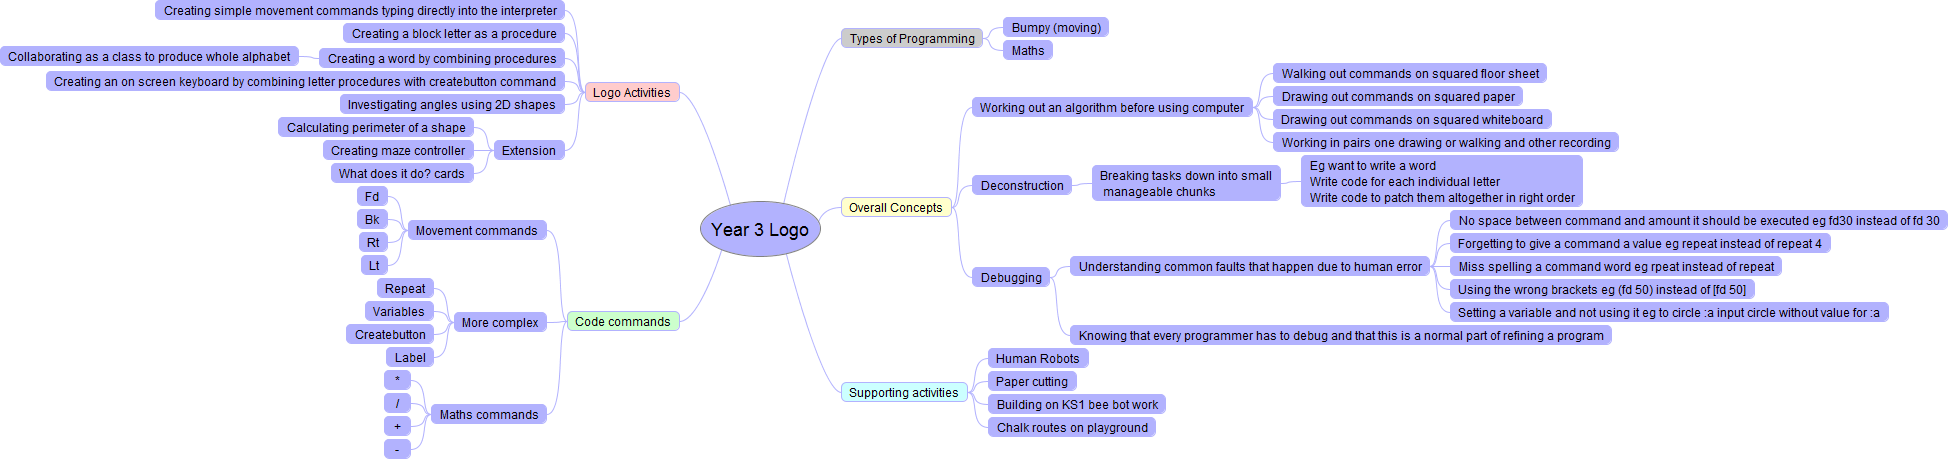 Imagemap